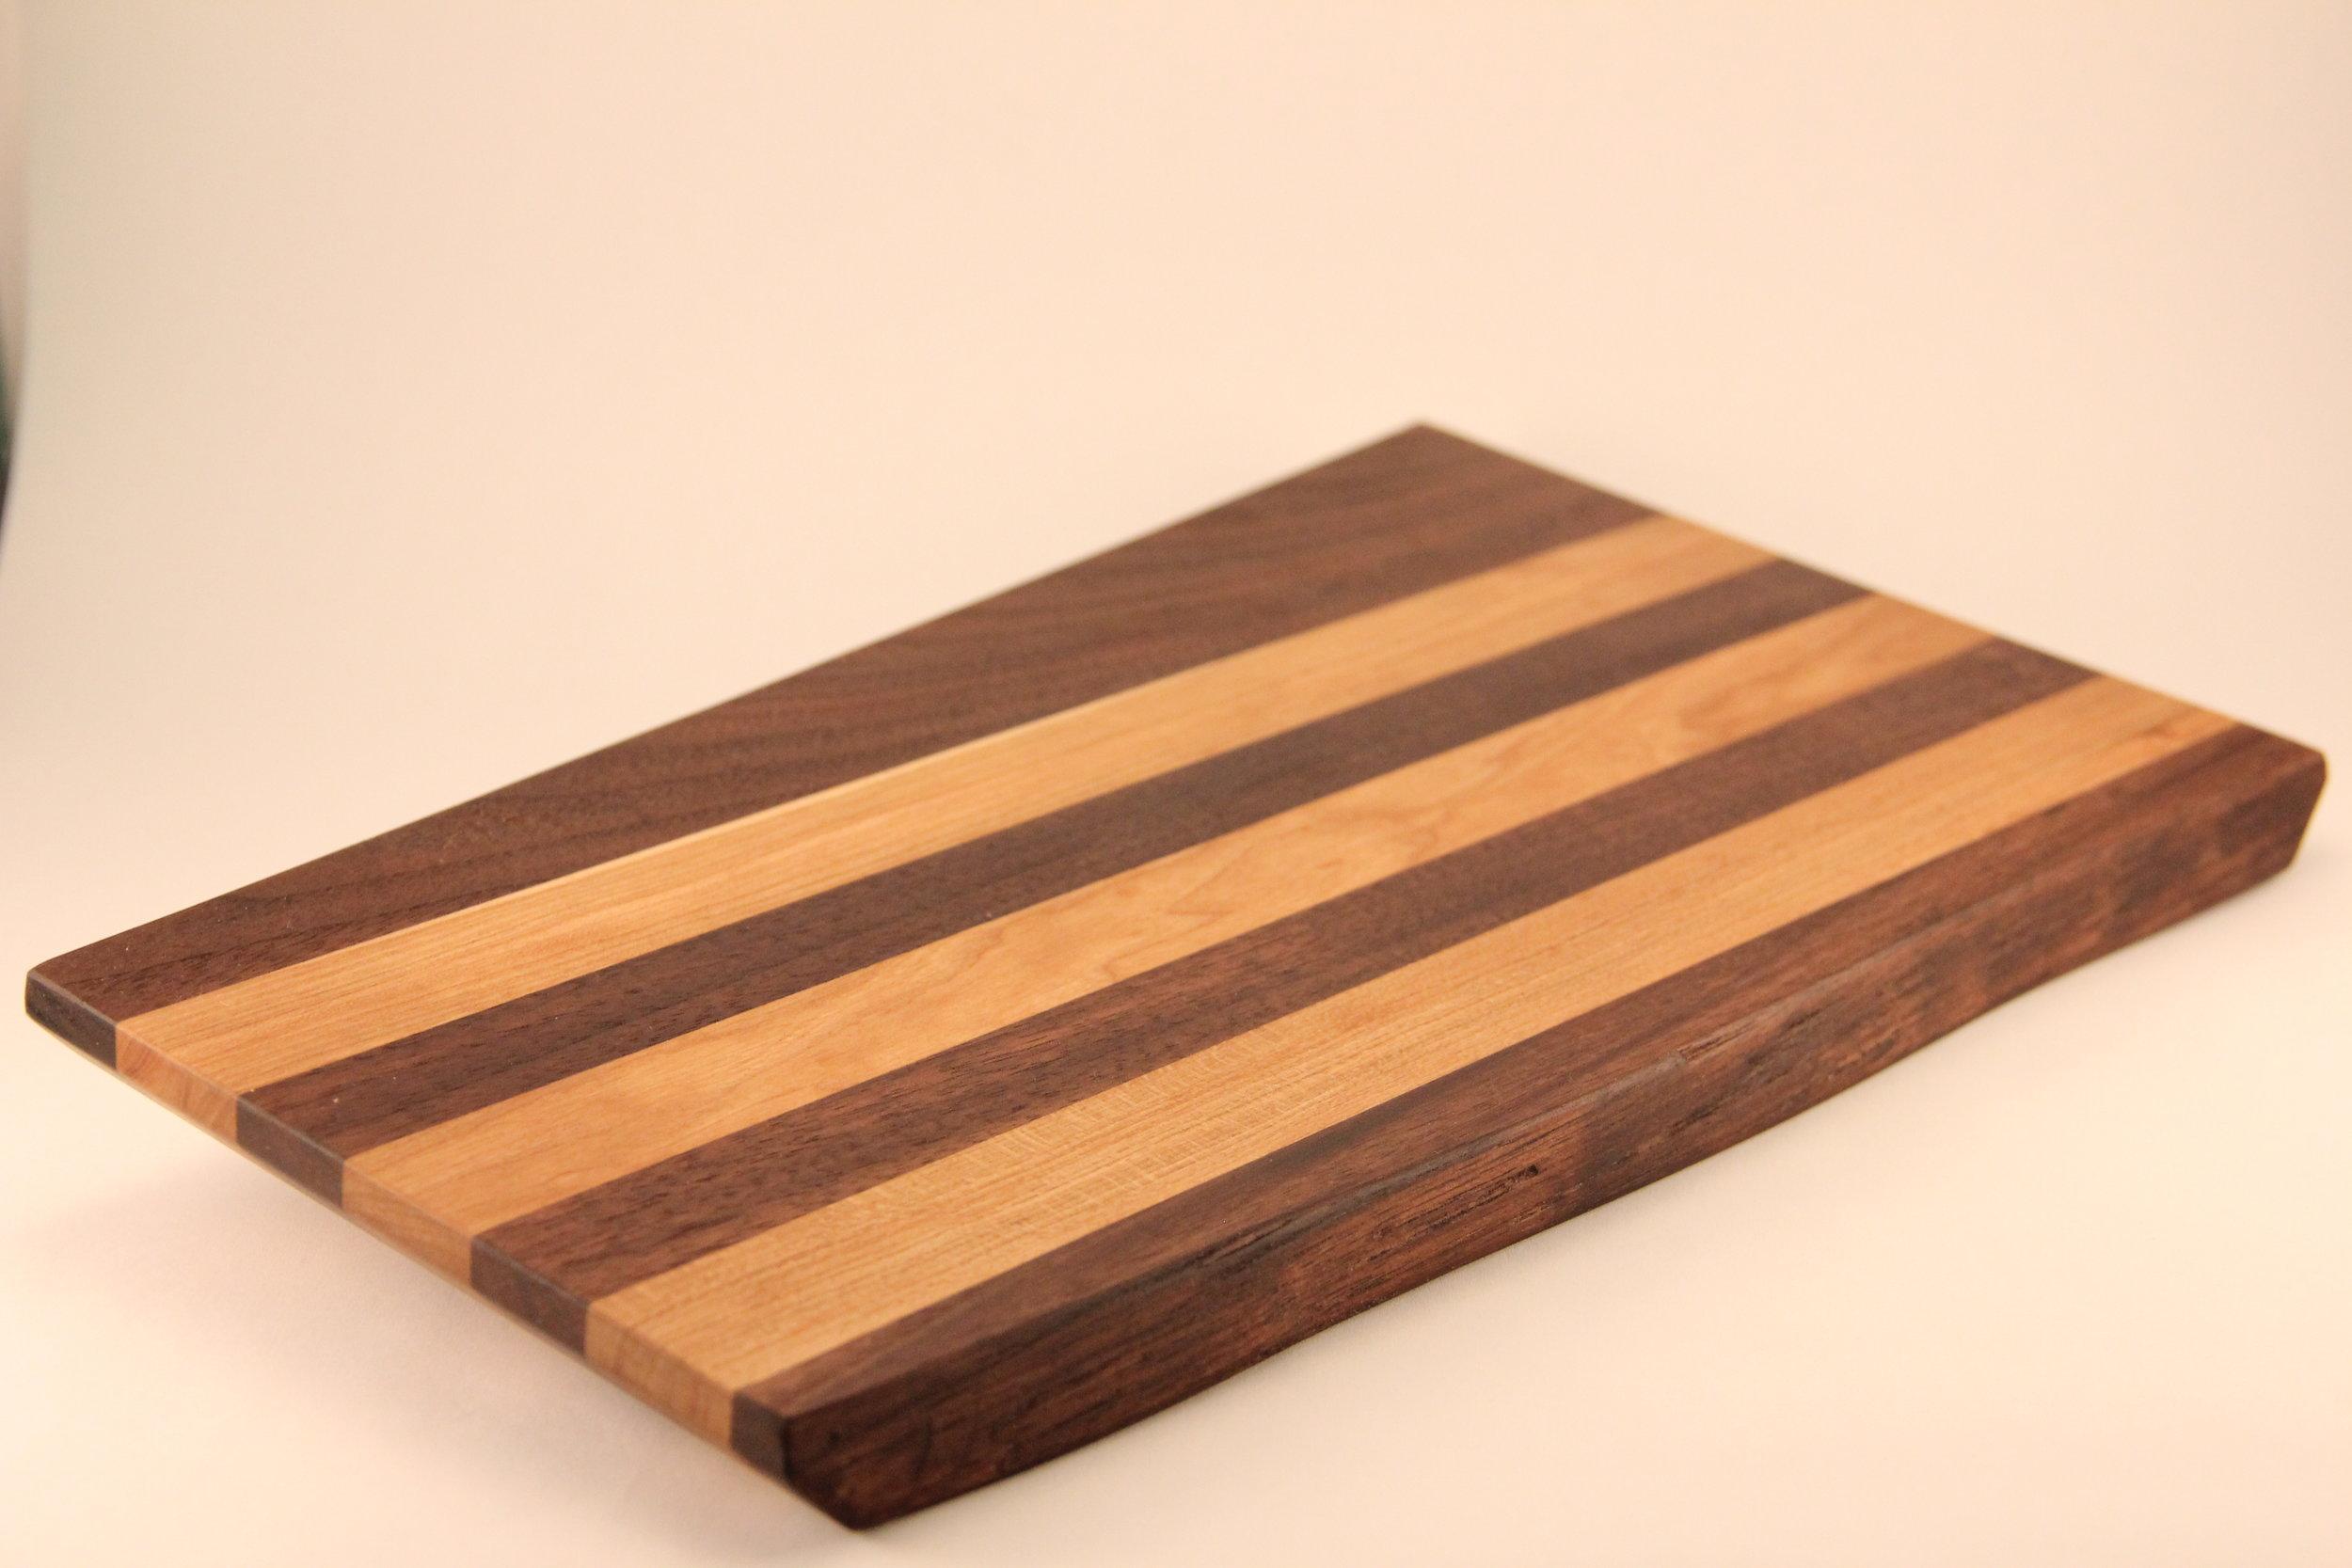 Walnut and Cherry Long Grain Cutting Board